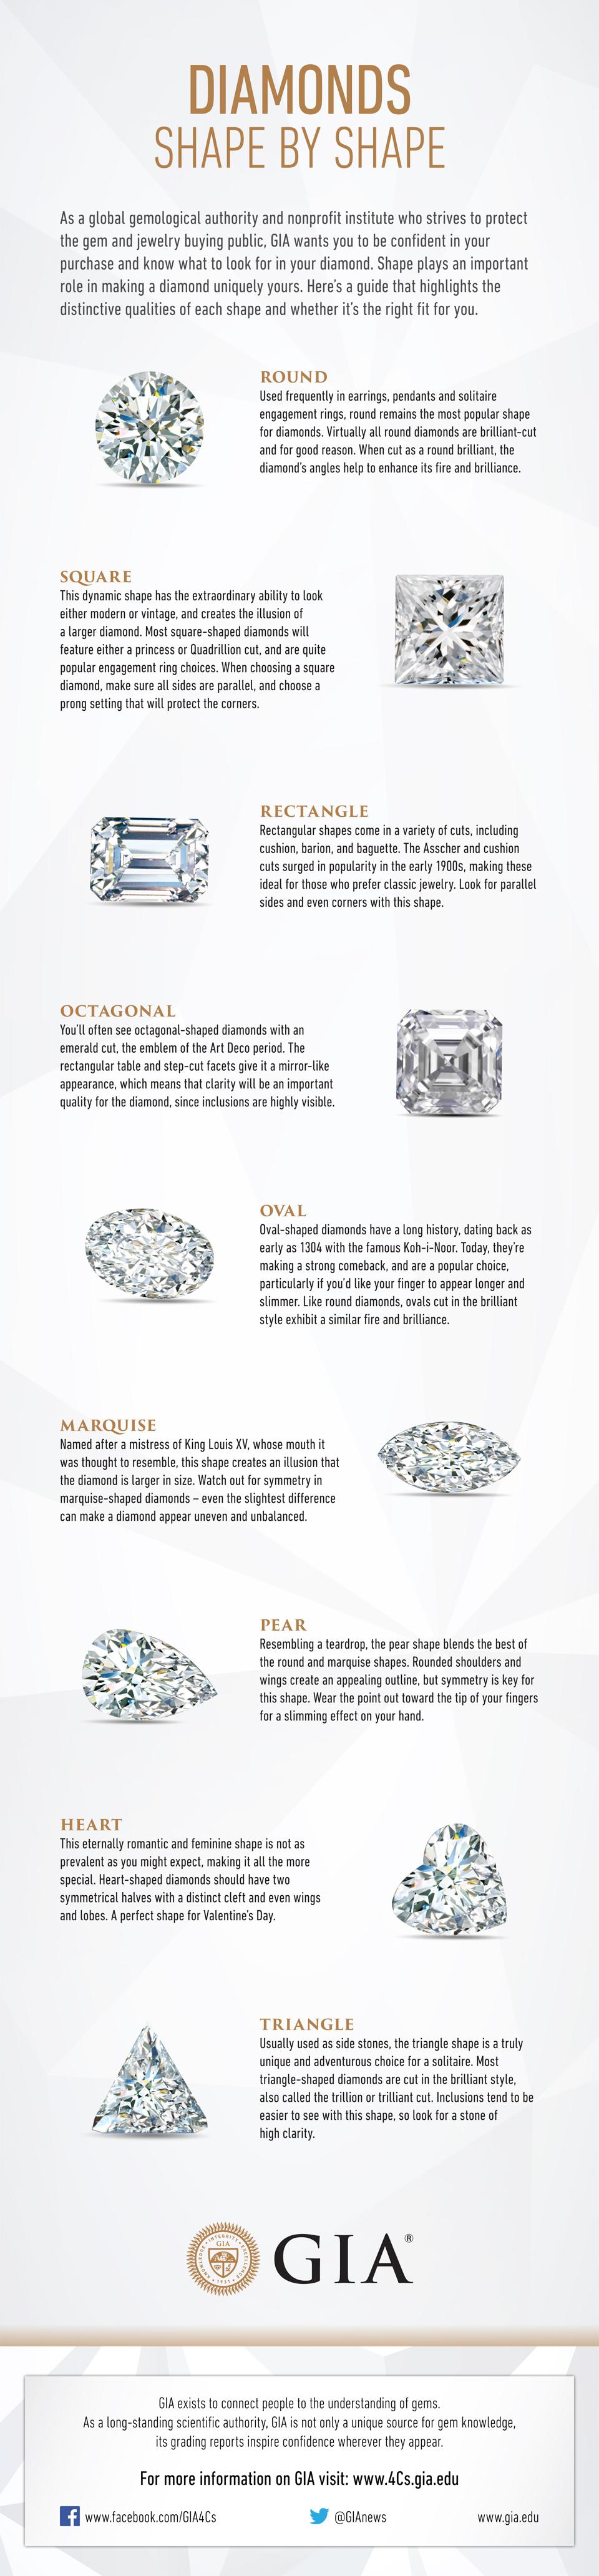 GIA chart of diamond shapes